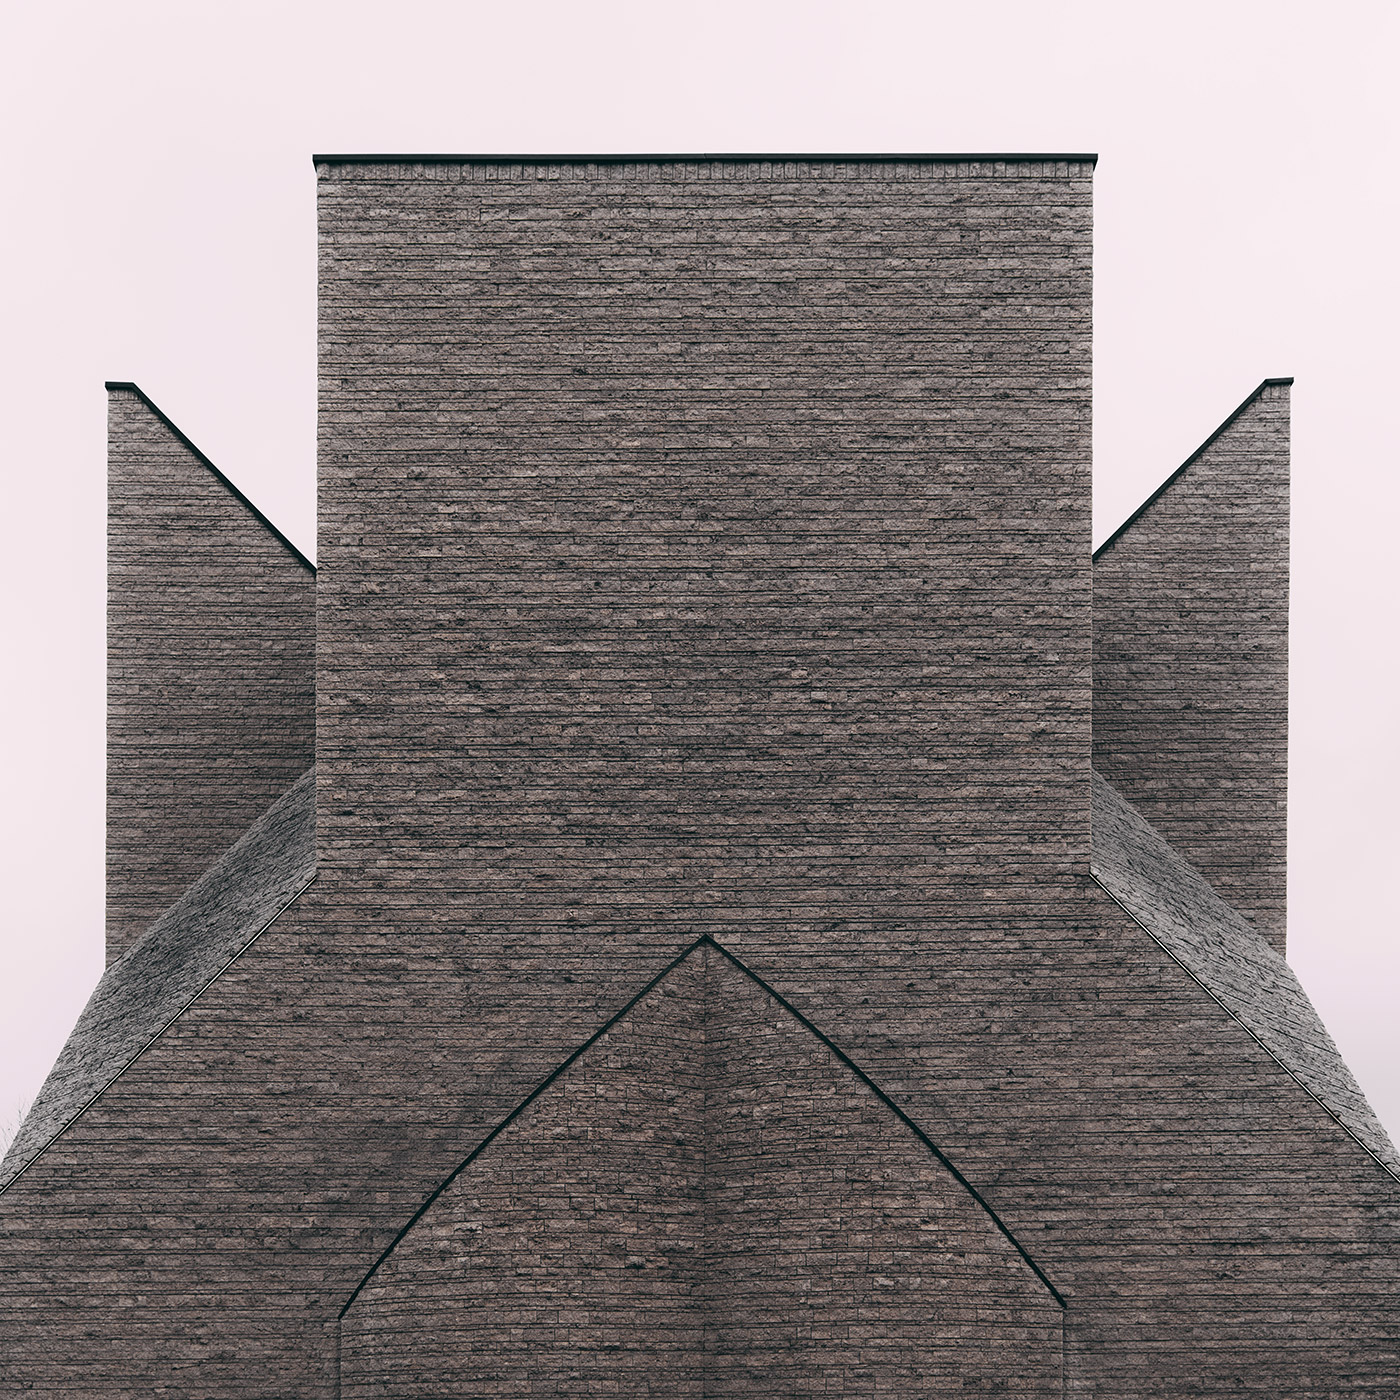 Centro pastorale Giovanni XIII <br />Location: Milan, Italy <br />Architect: Botta Mario